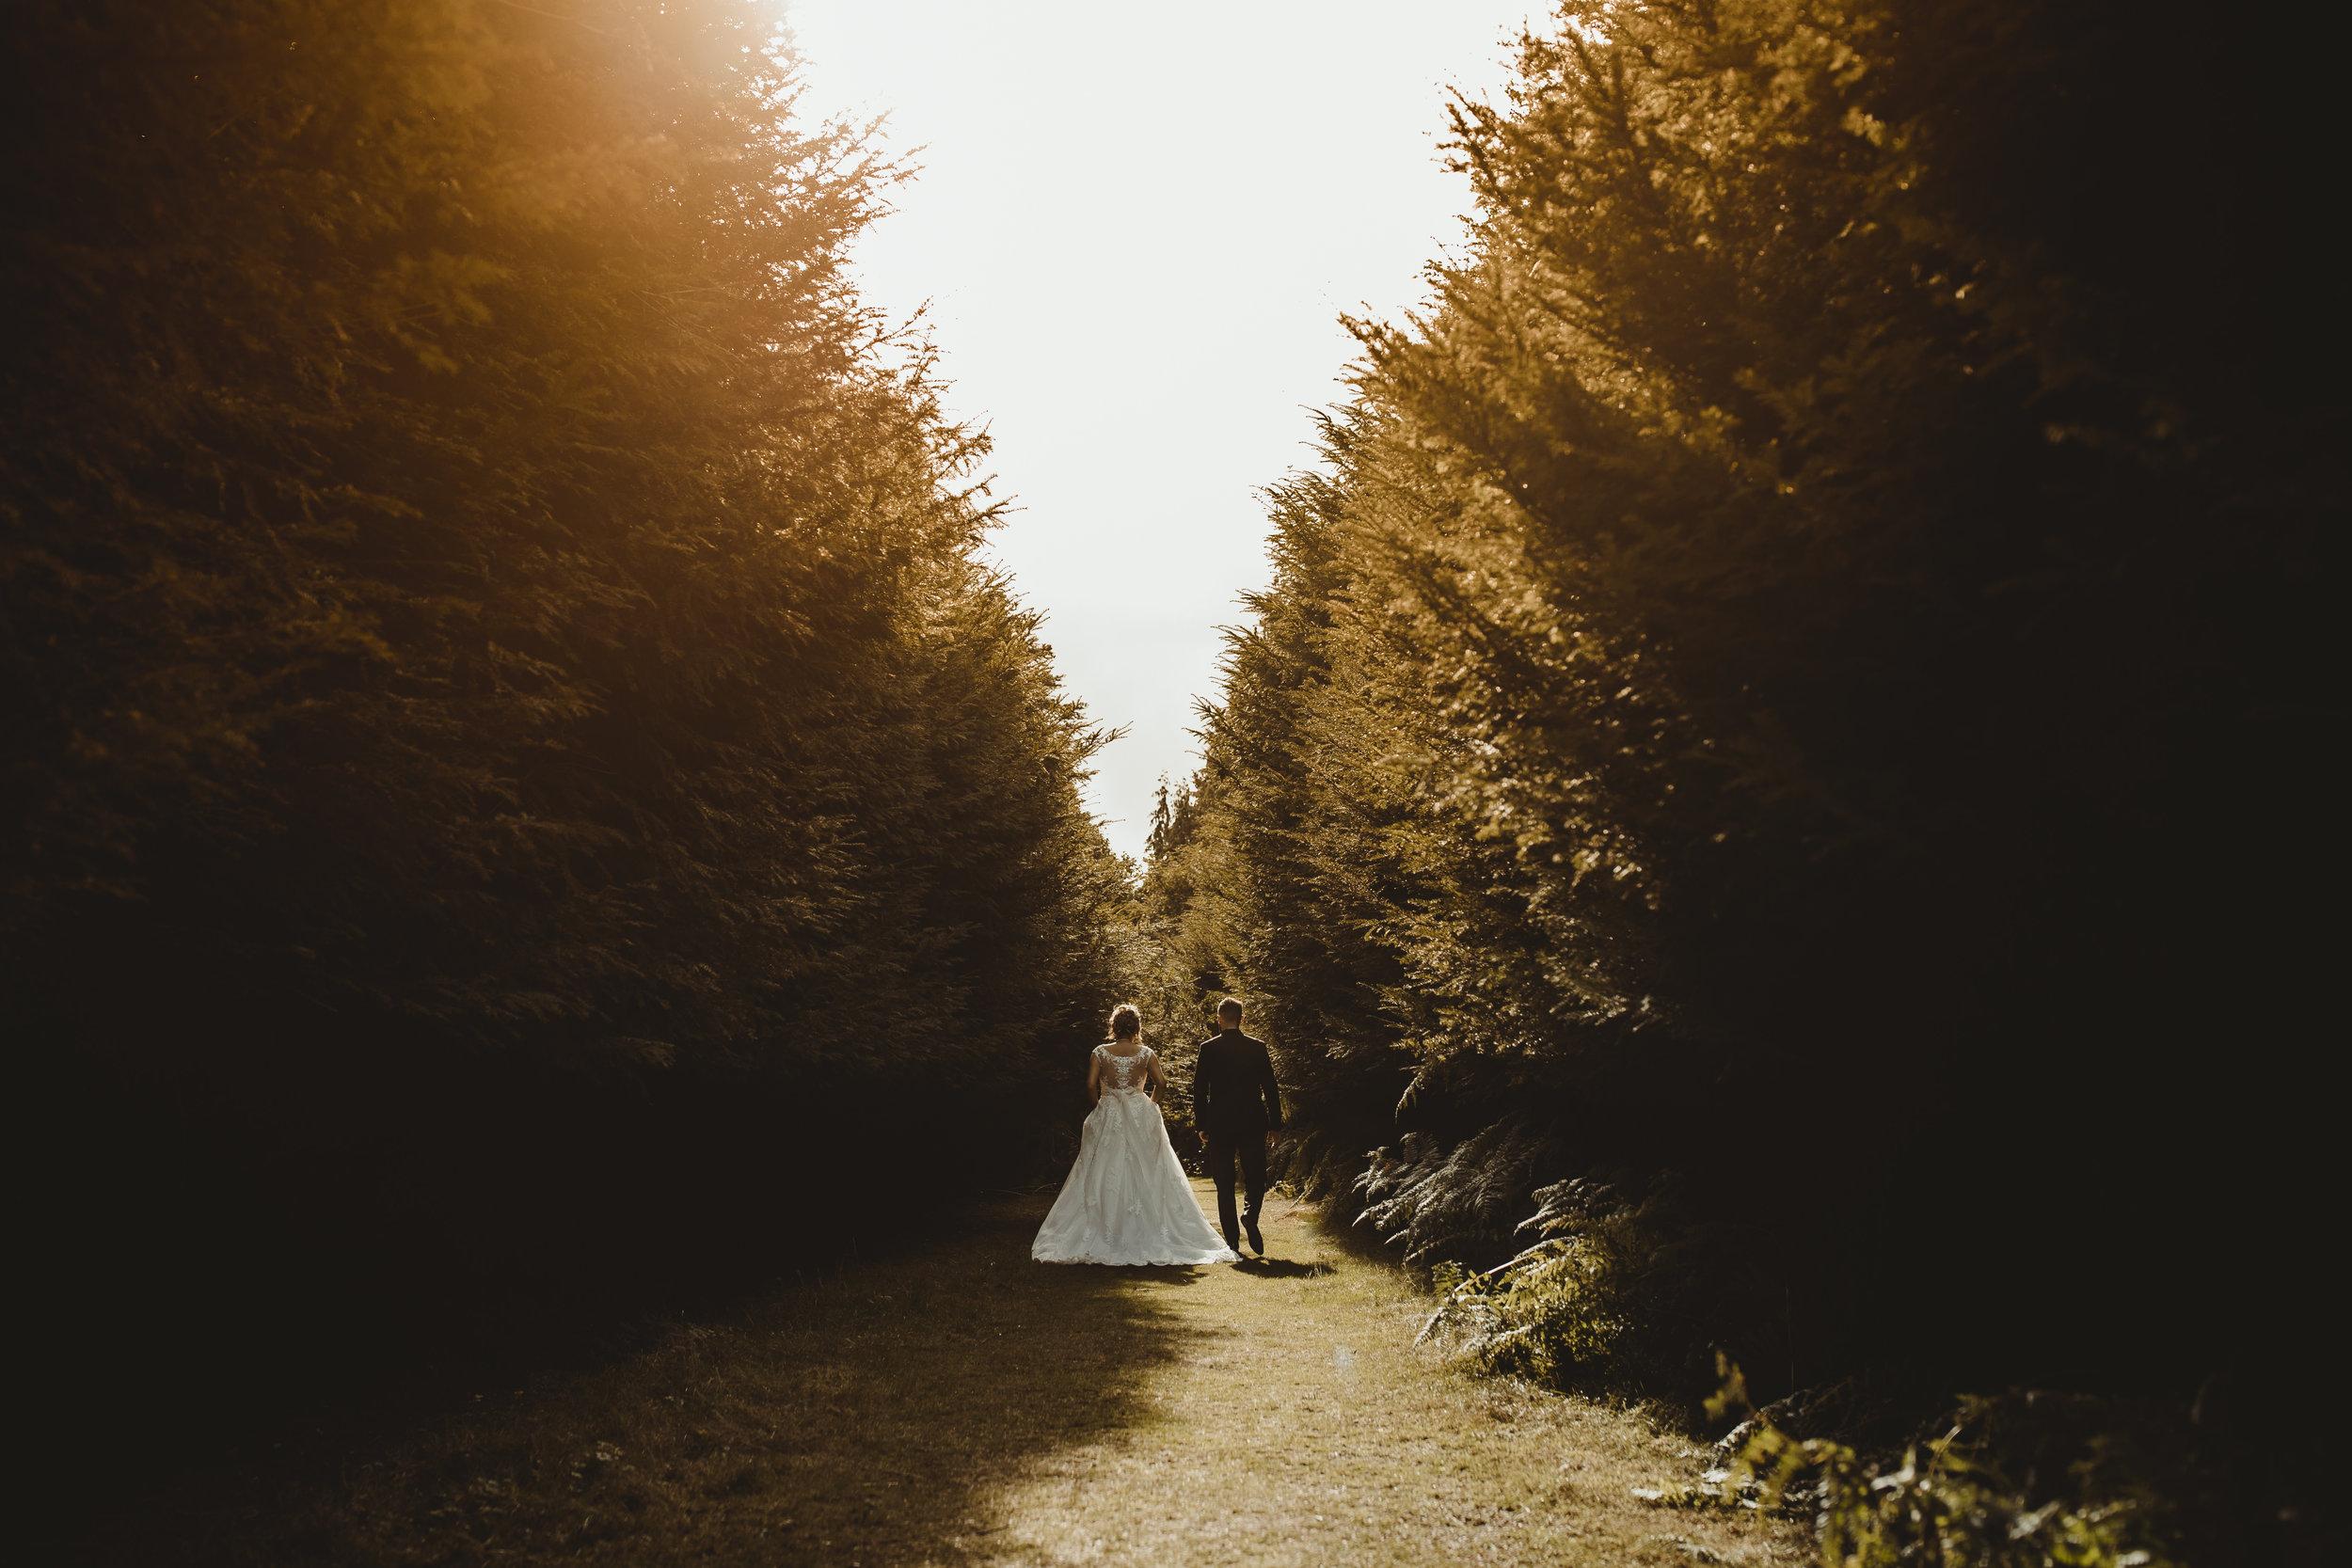 Lucy&Joseph_LONDON_WEDDING_PHOTOGRAPHER_SURREY_LONDON-449.JPG